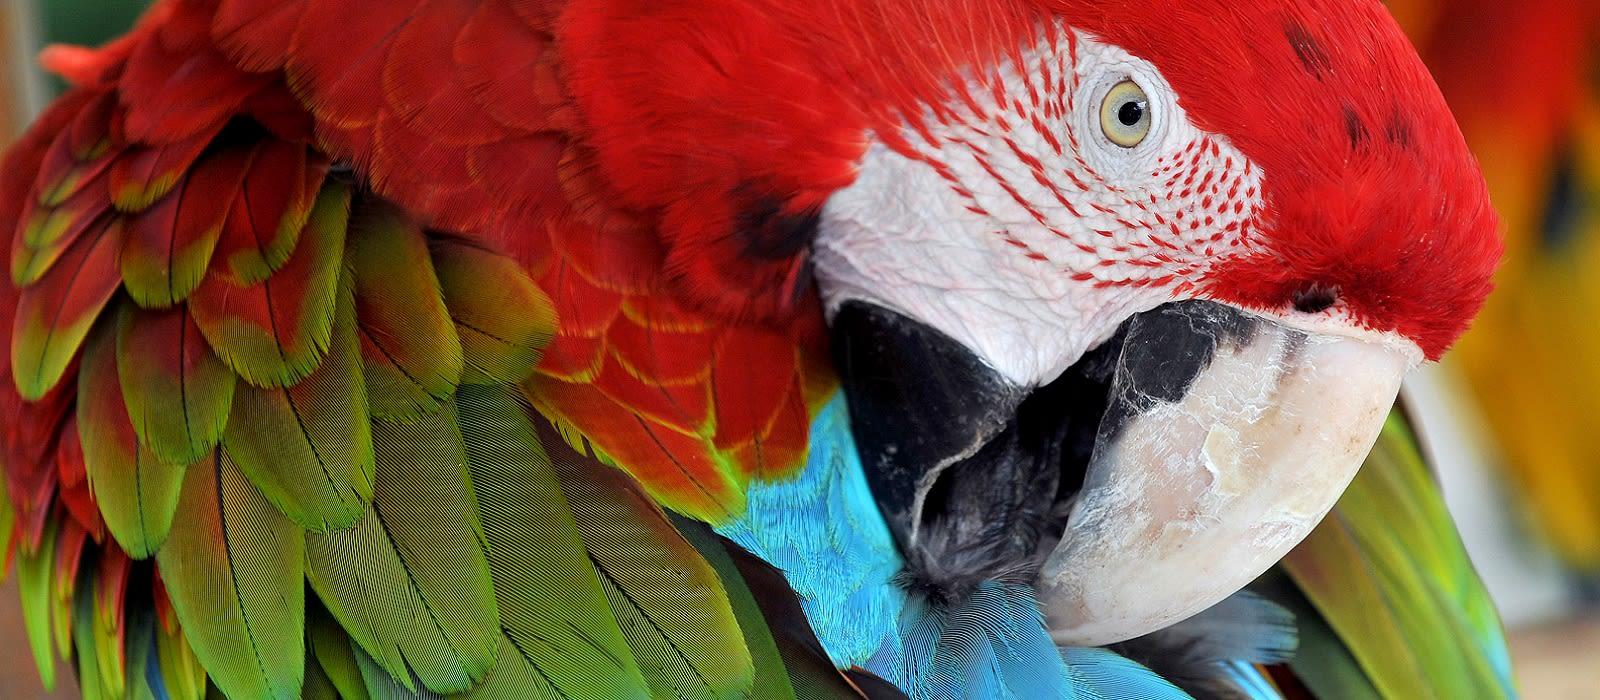 Exotische Vögel & Bezaubernde Landschaften – Vogelbeobachtung in Guatemala Urlaub 1